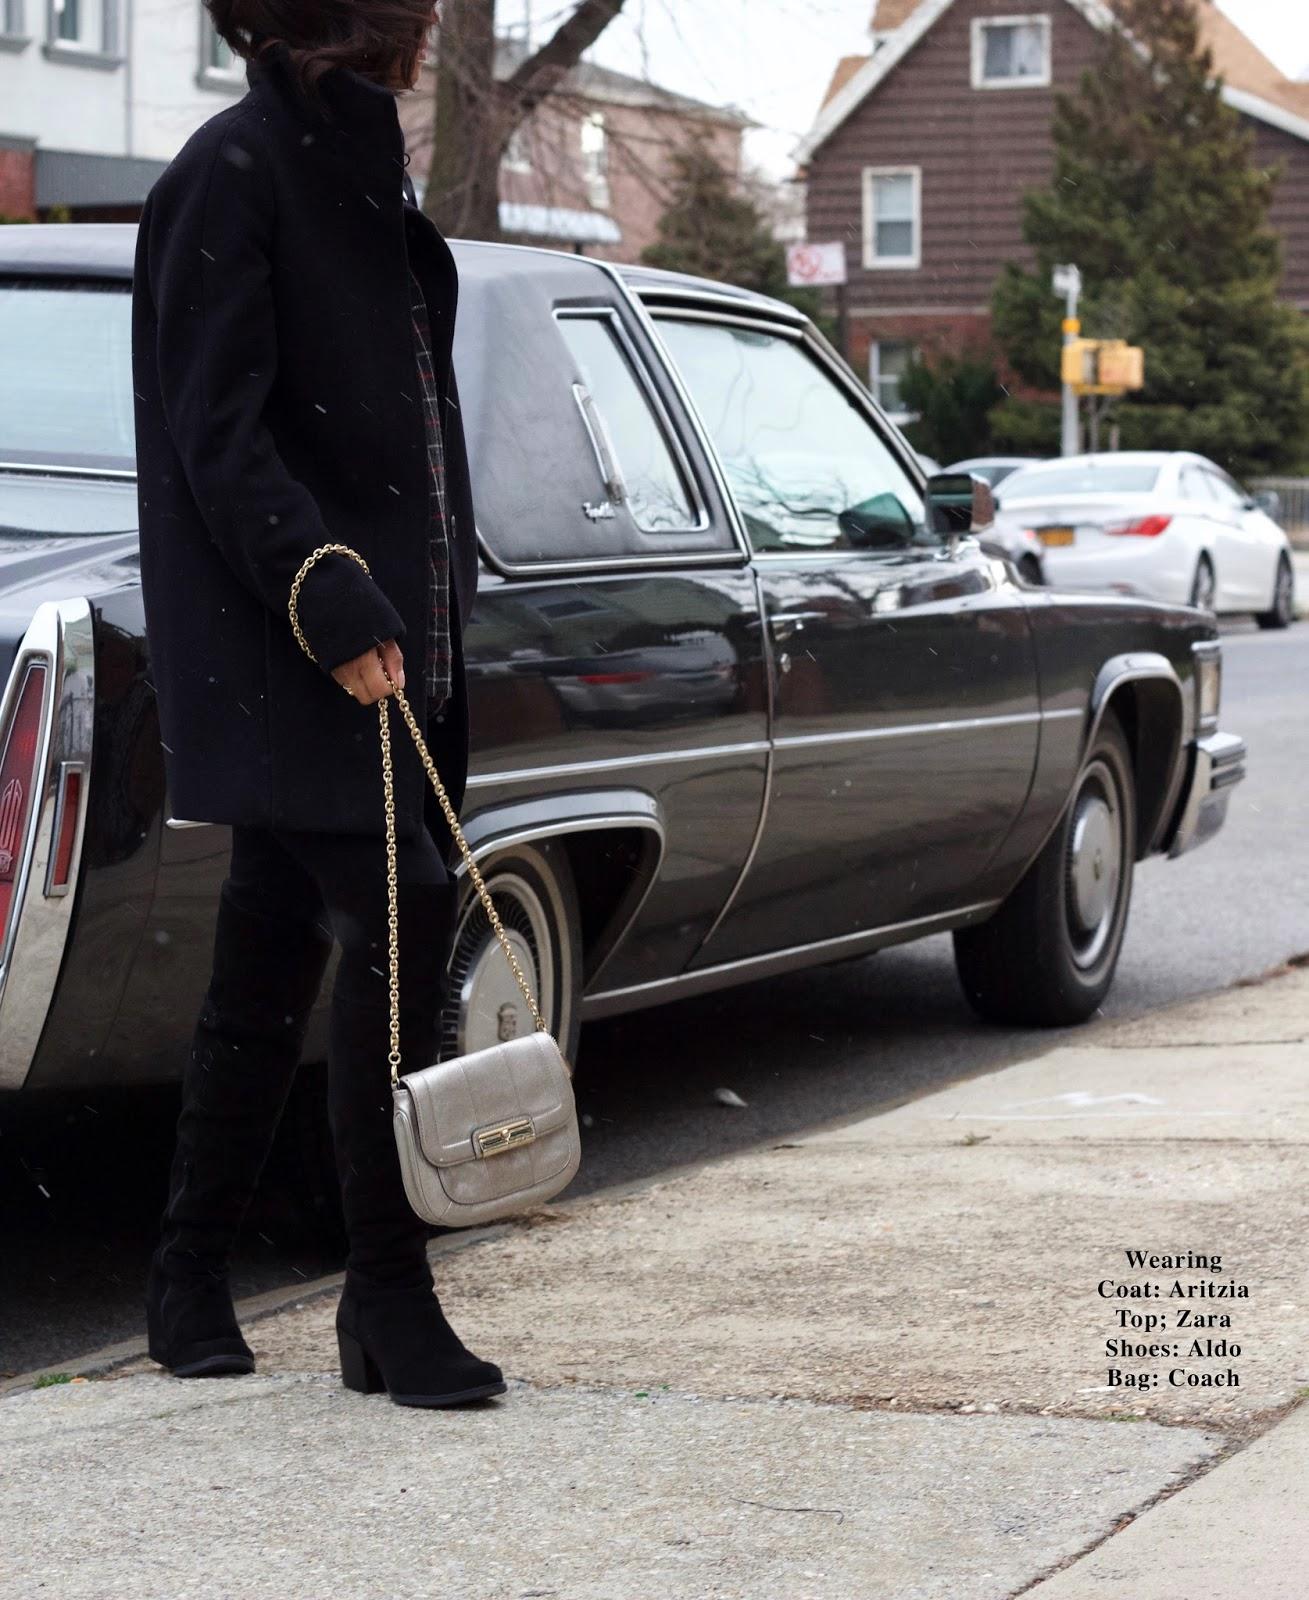 black coat and high black boots